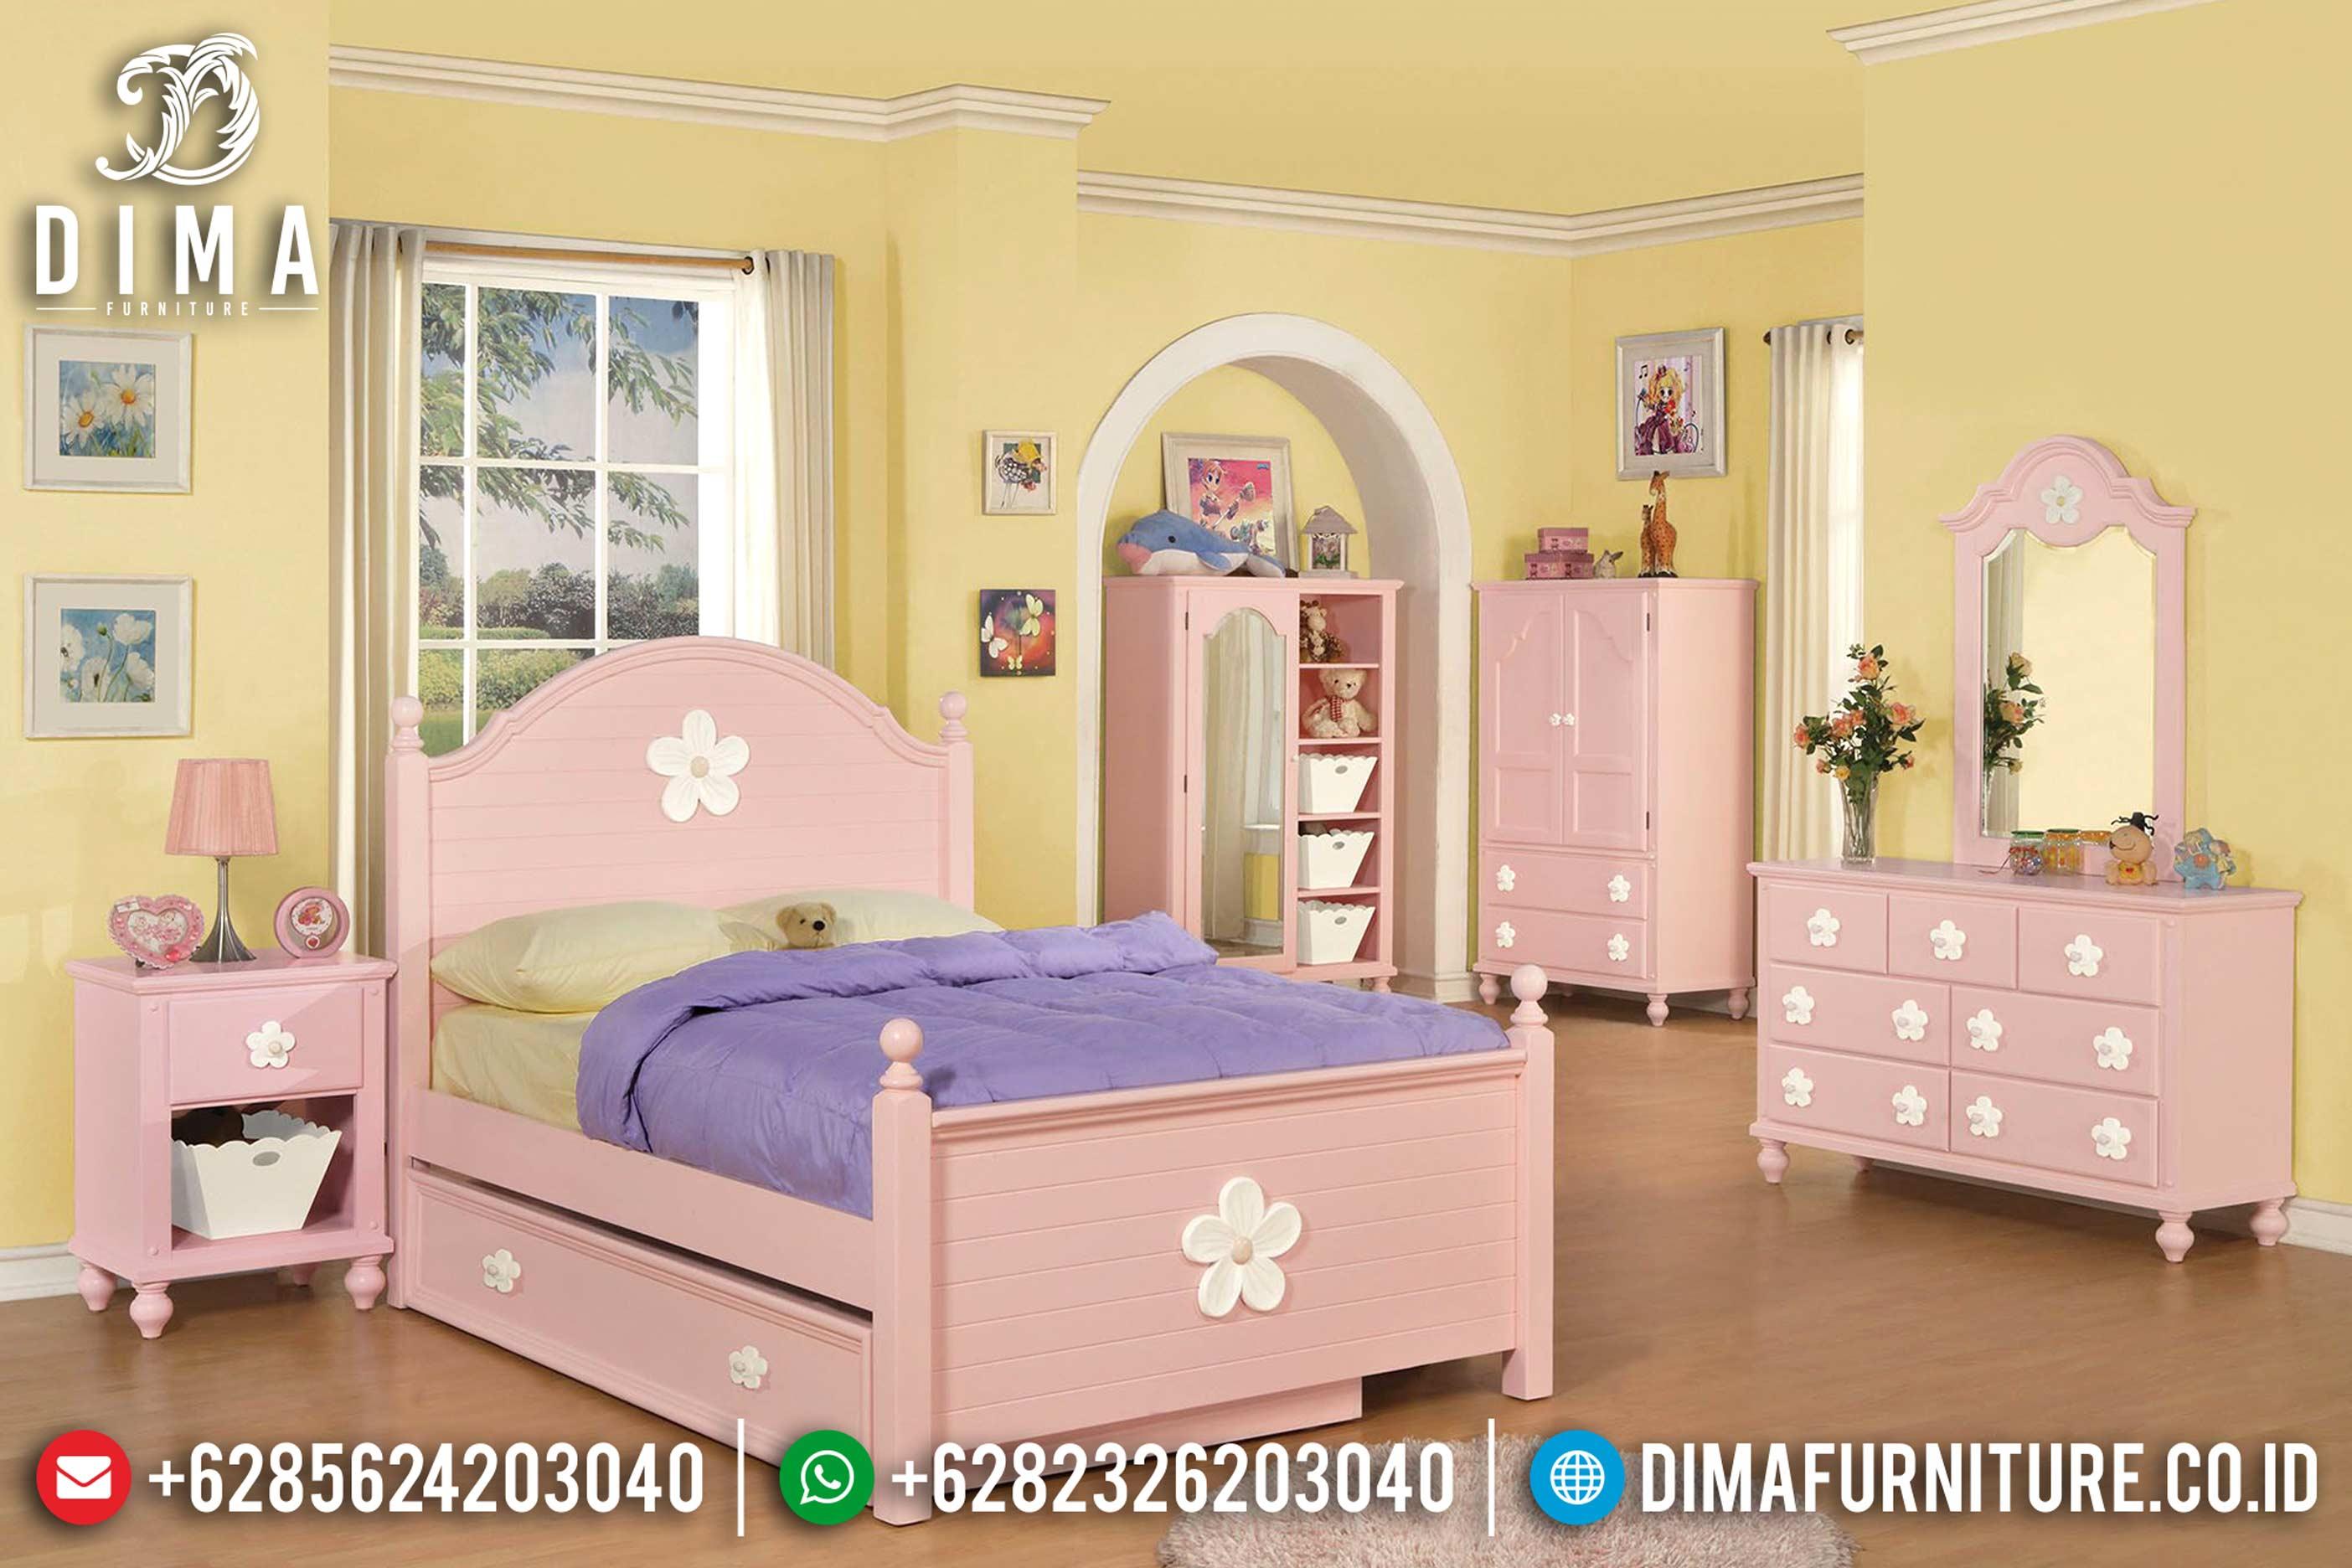 Set Kamar Tidur Anak Minimalis Mebel Jepara Terbaru Pink Duco DF-0612